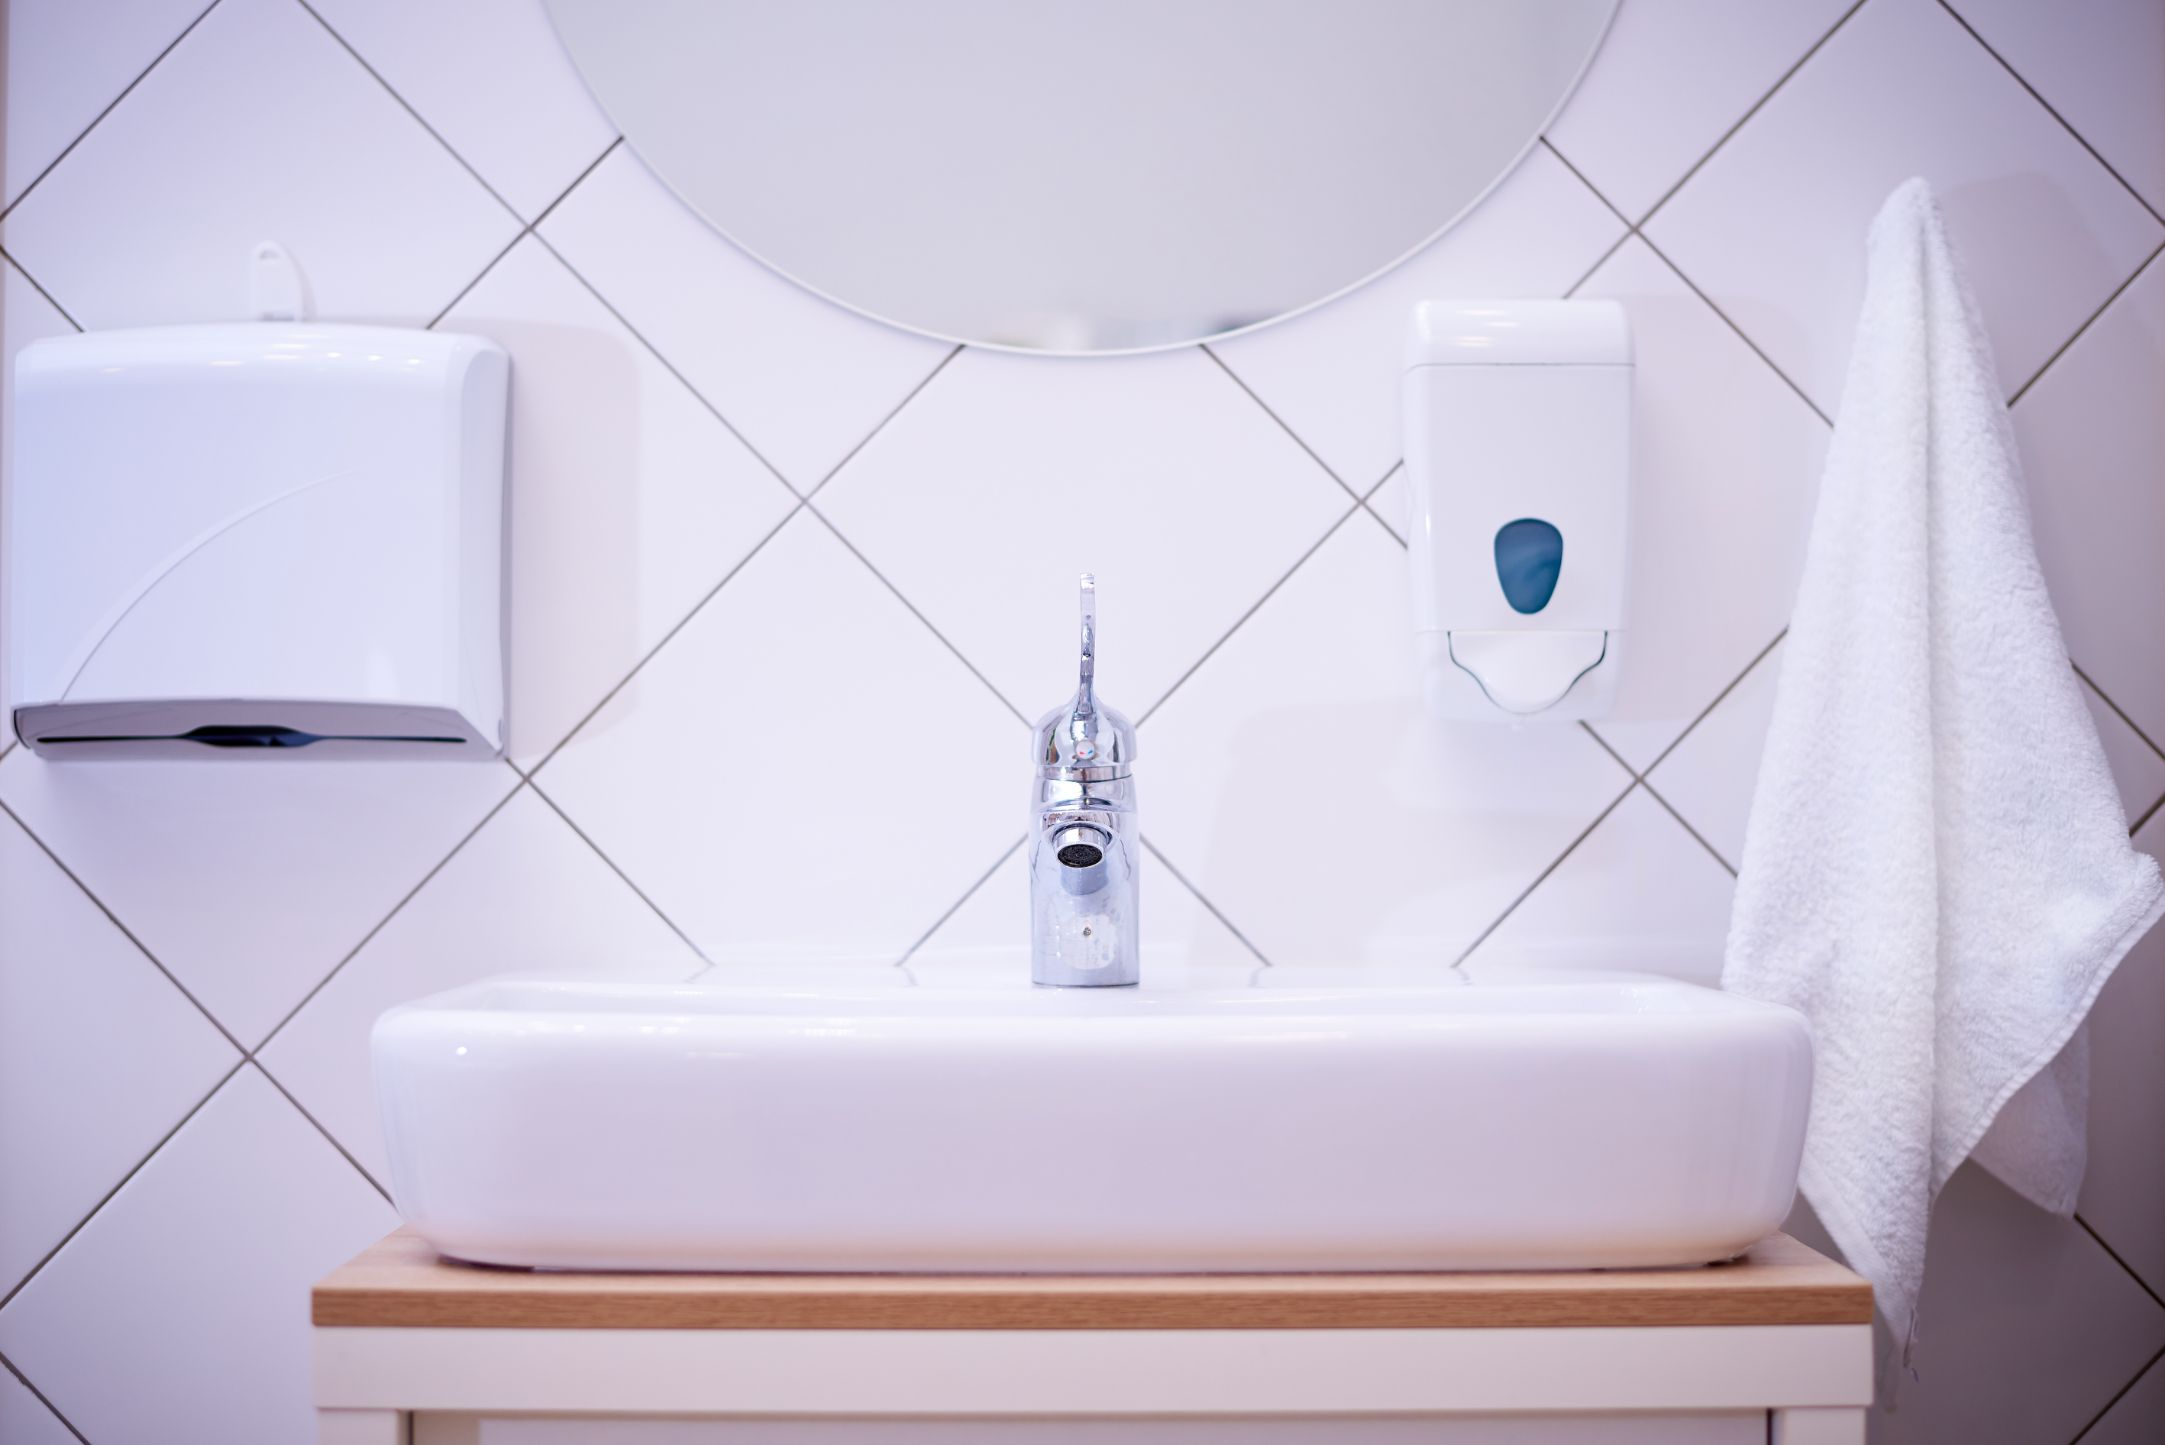 repair sink st. charles IL